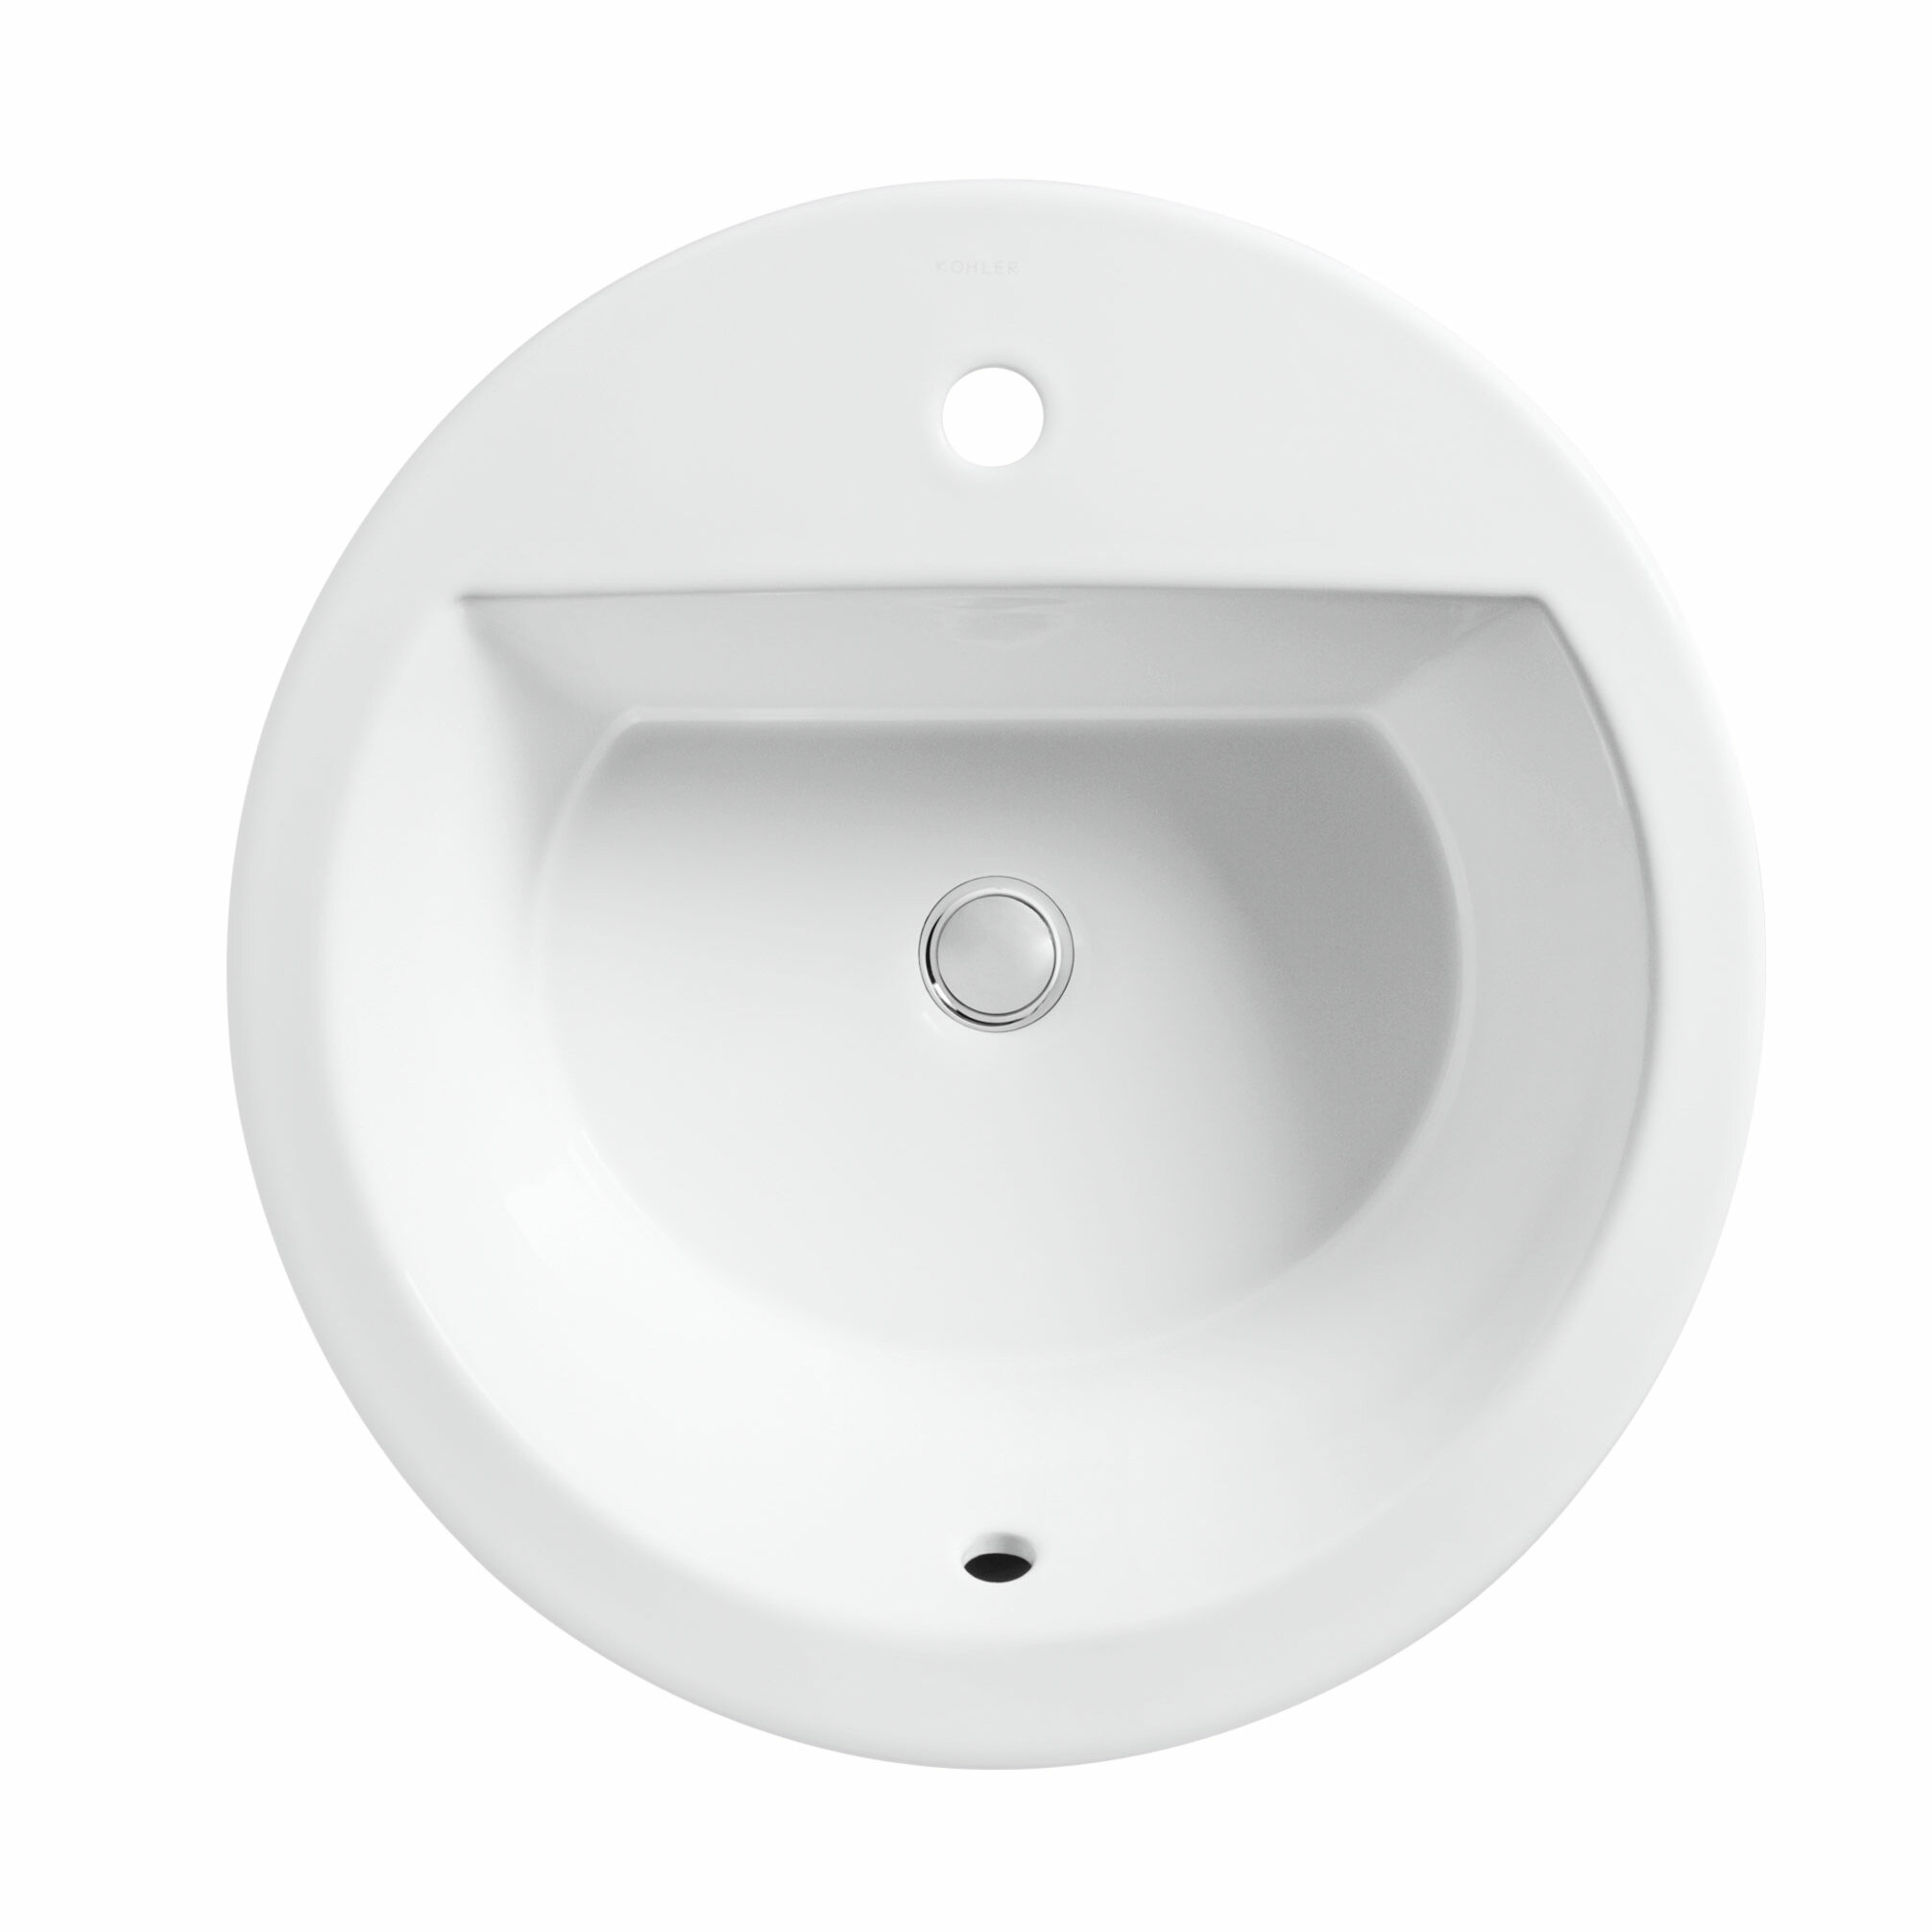 K 2714 1 0 4 58 96 Kohler Bryant Ceramic Circular Drop In